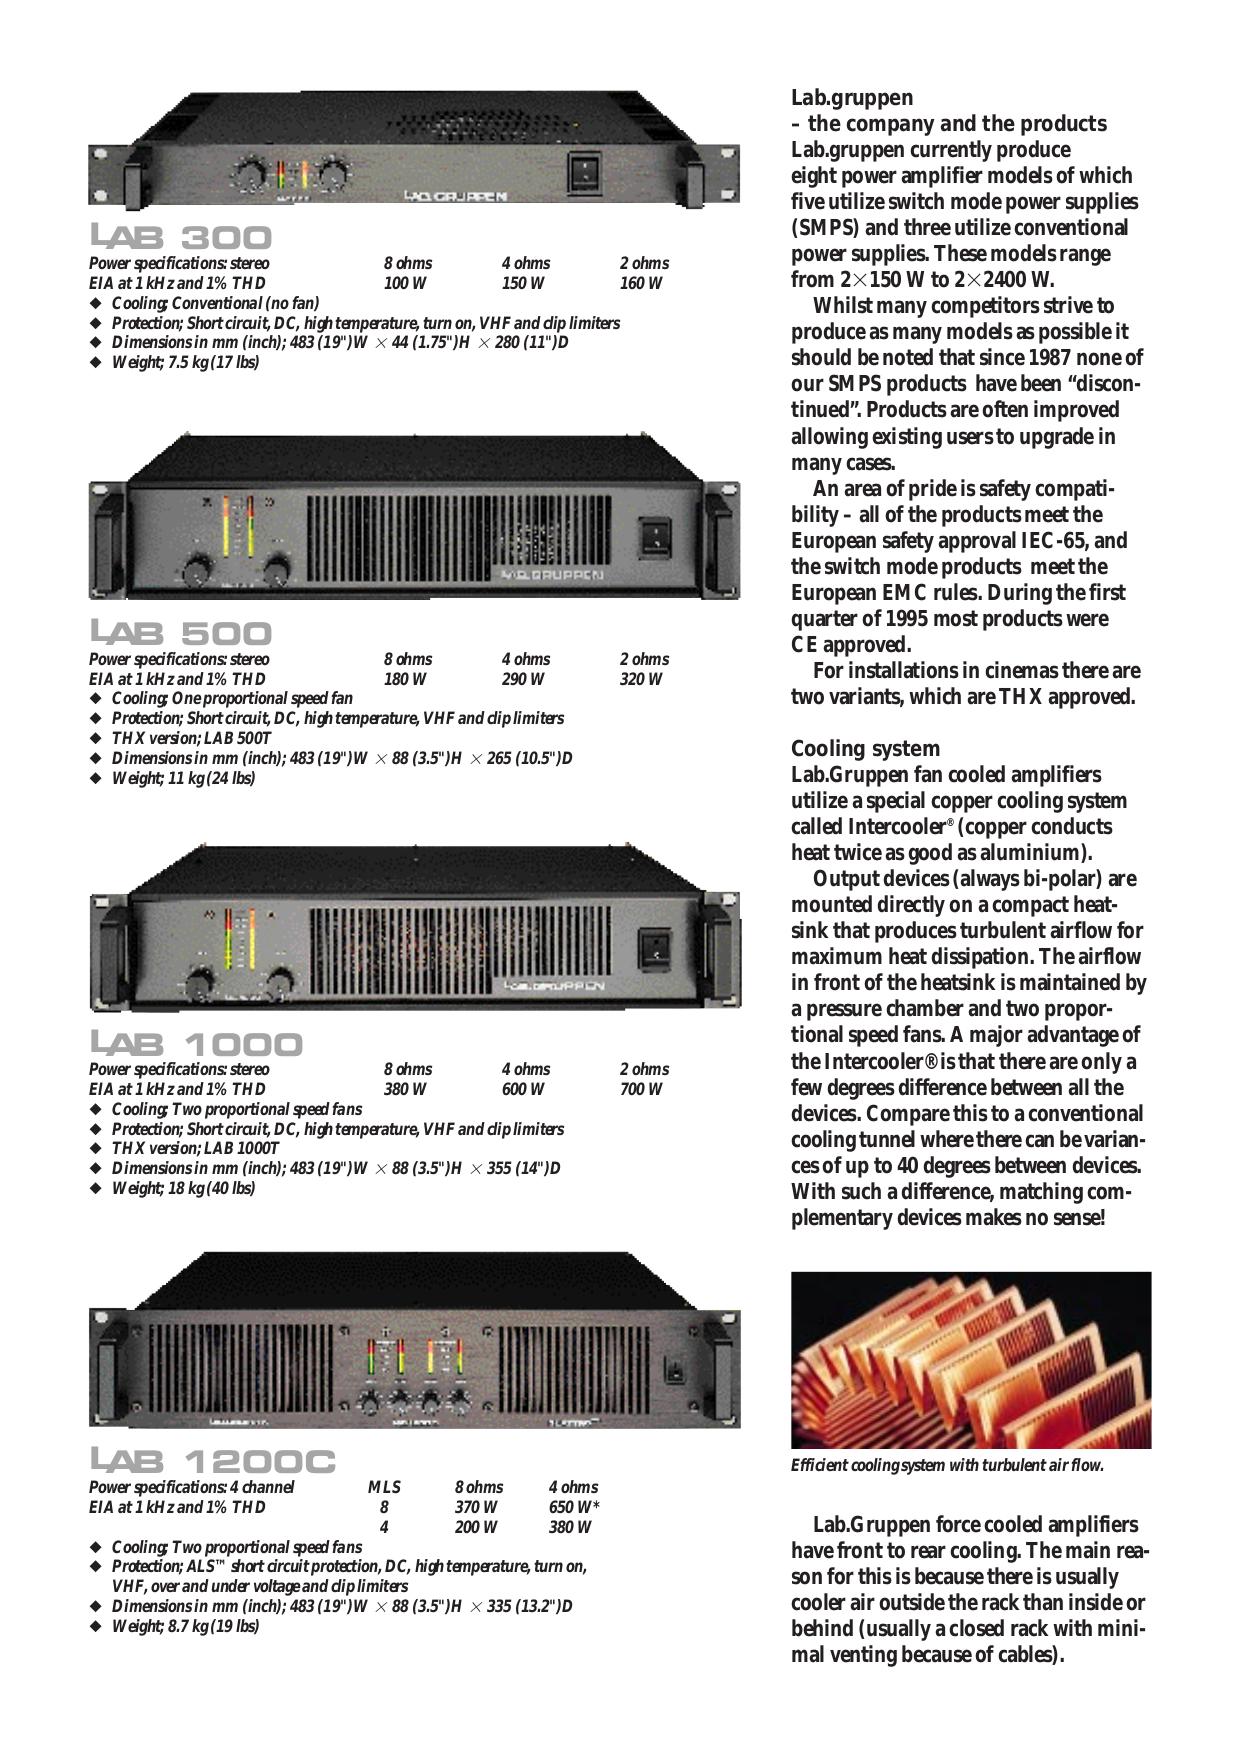 pdf for Lab.gruppen Amp LAB 300 manual